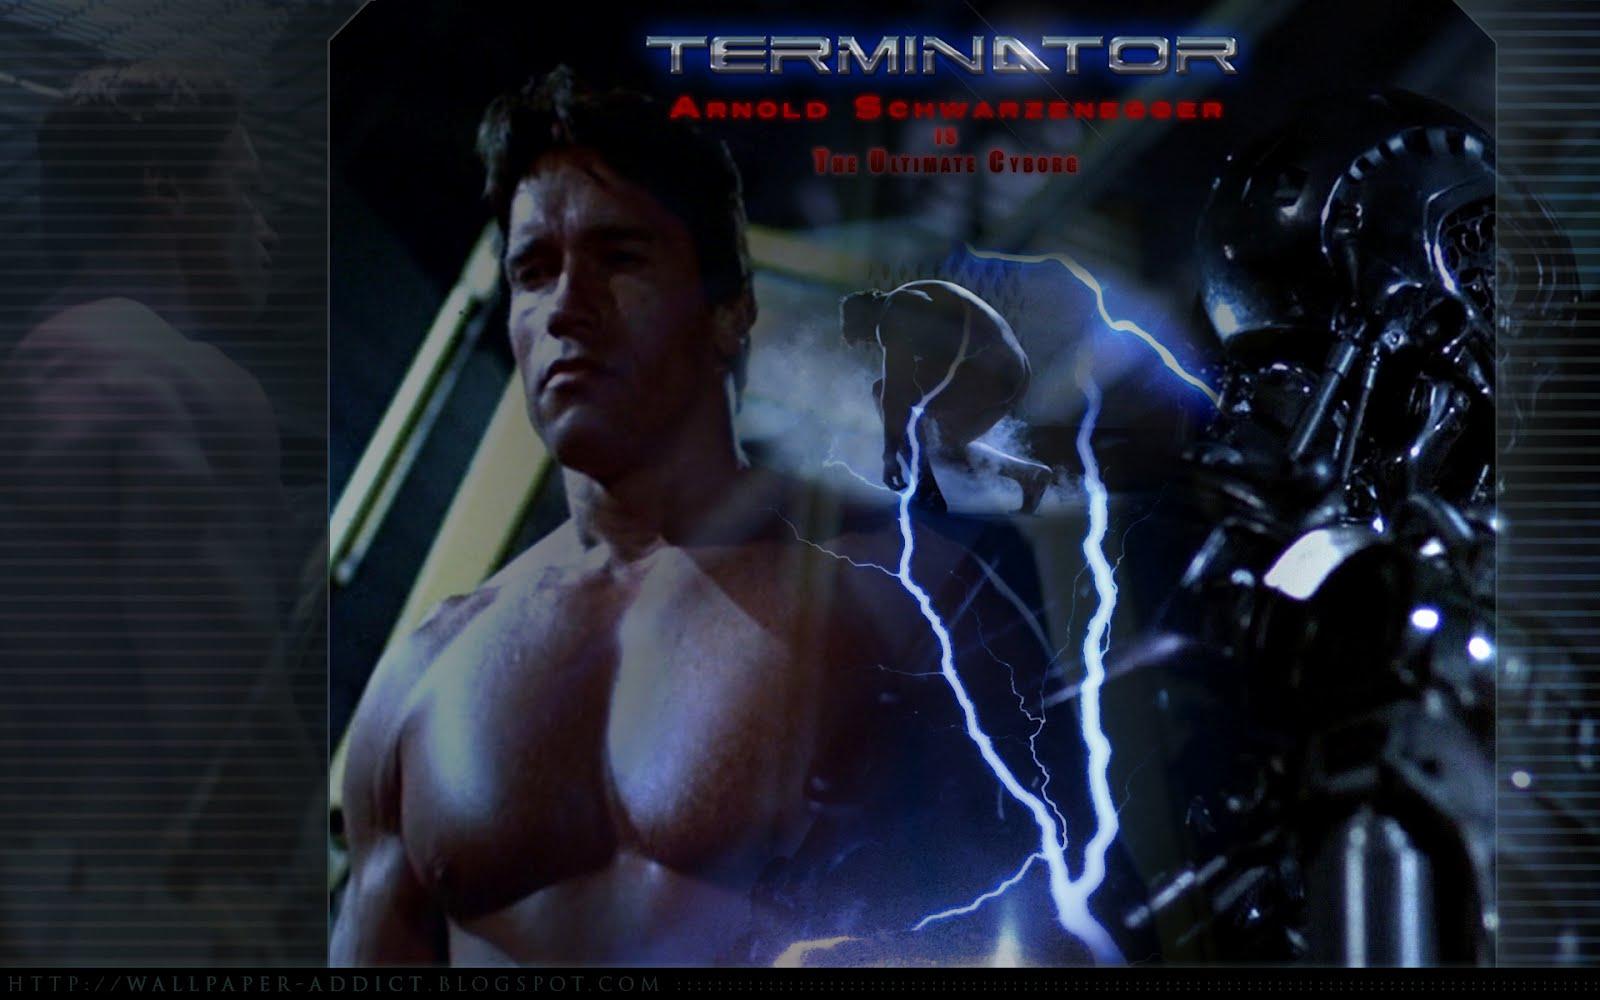 http://3.bp.blogspot.com/-a9pRdfy5MA4/T7R2GXpXazI/AAAAAAAABLE/xLi816jOIyQ/s1600/Arnold-Schwarzenegger%2BTERMINATOR%2BWALLPAPER2.jpg